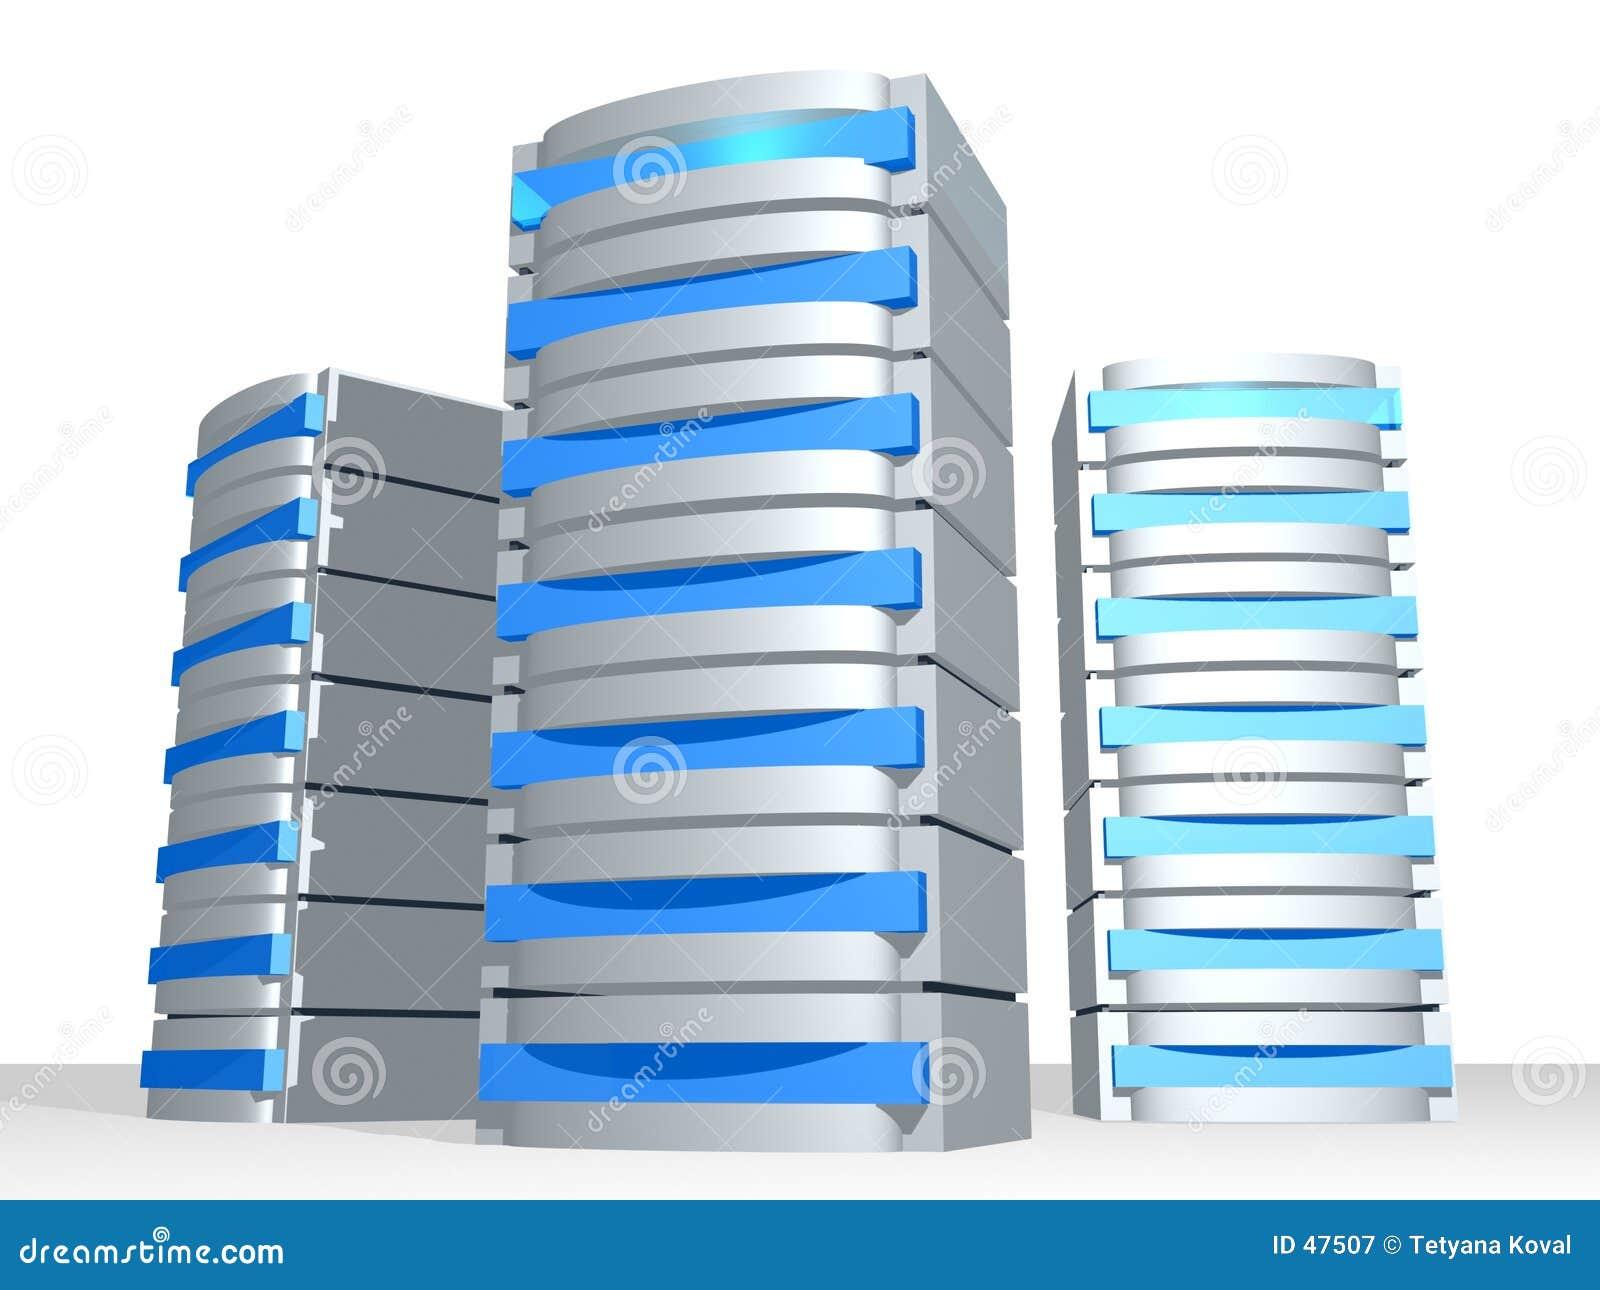 Group Servers 42